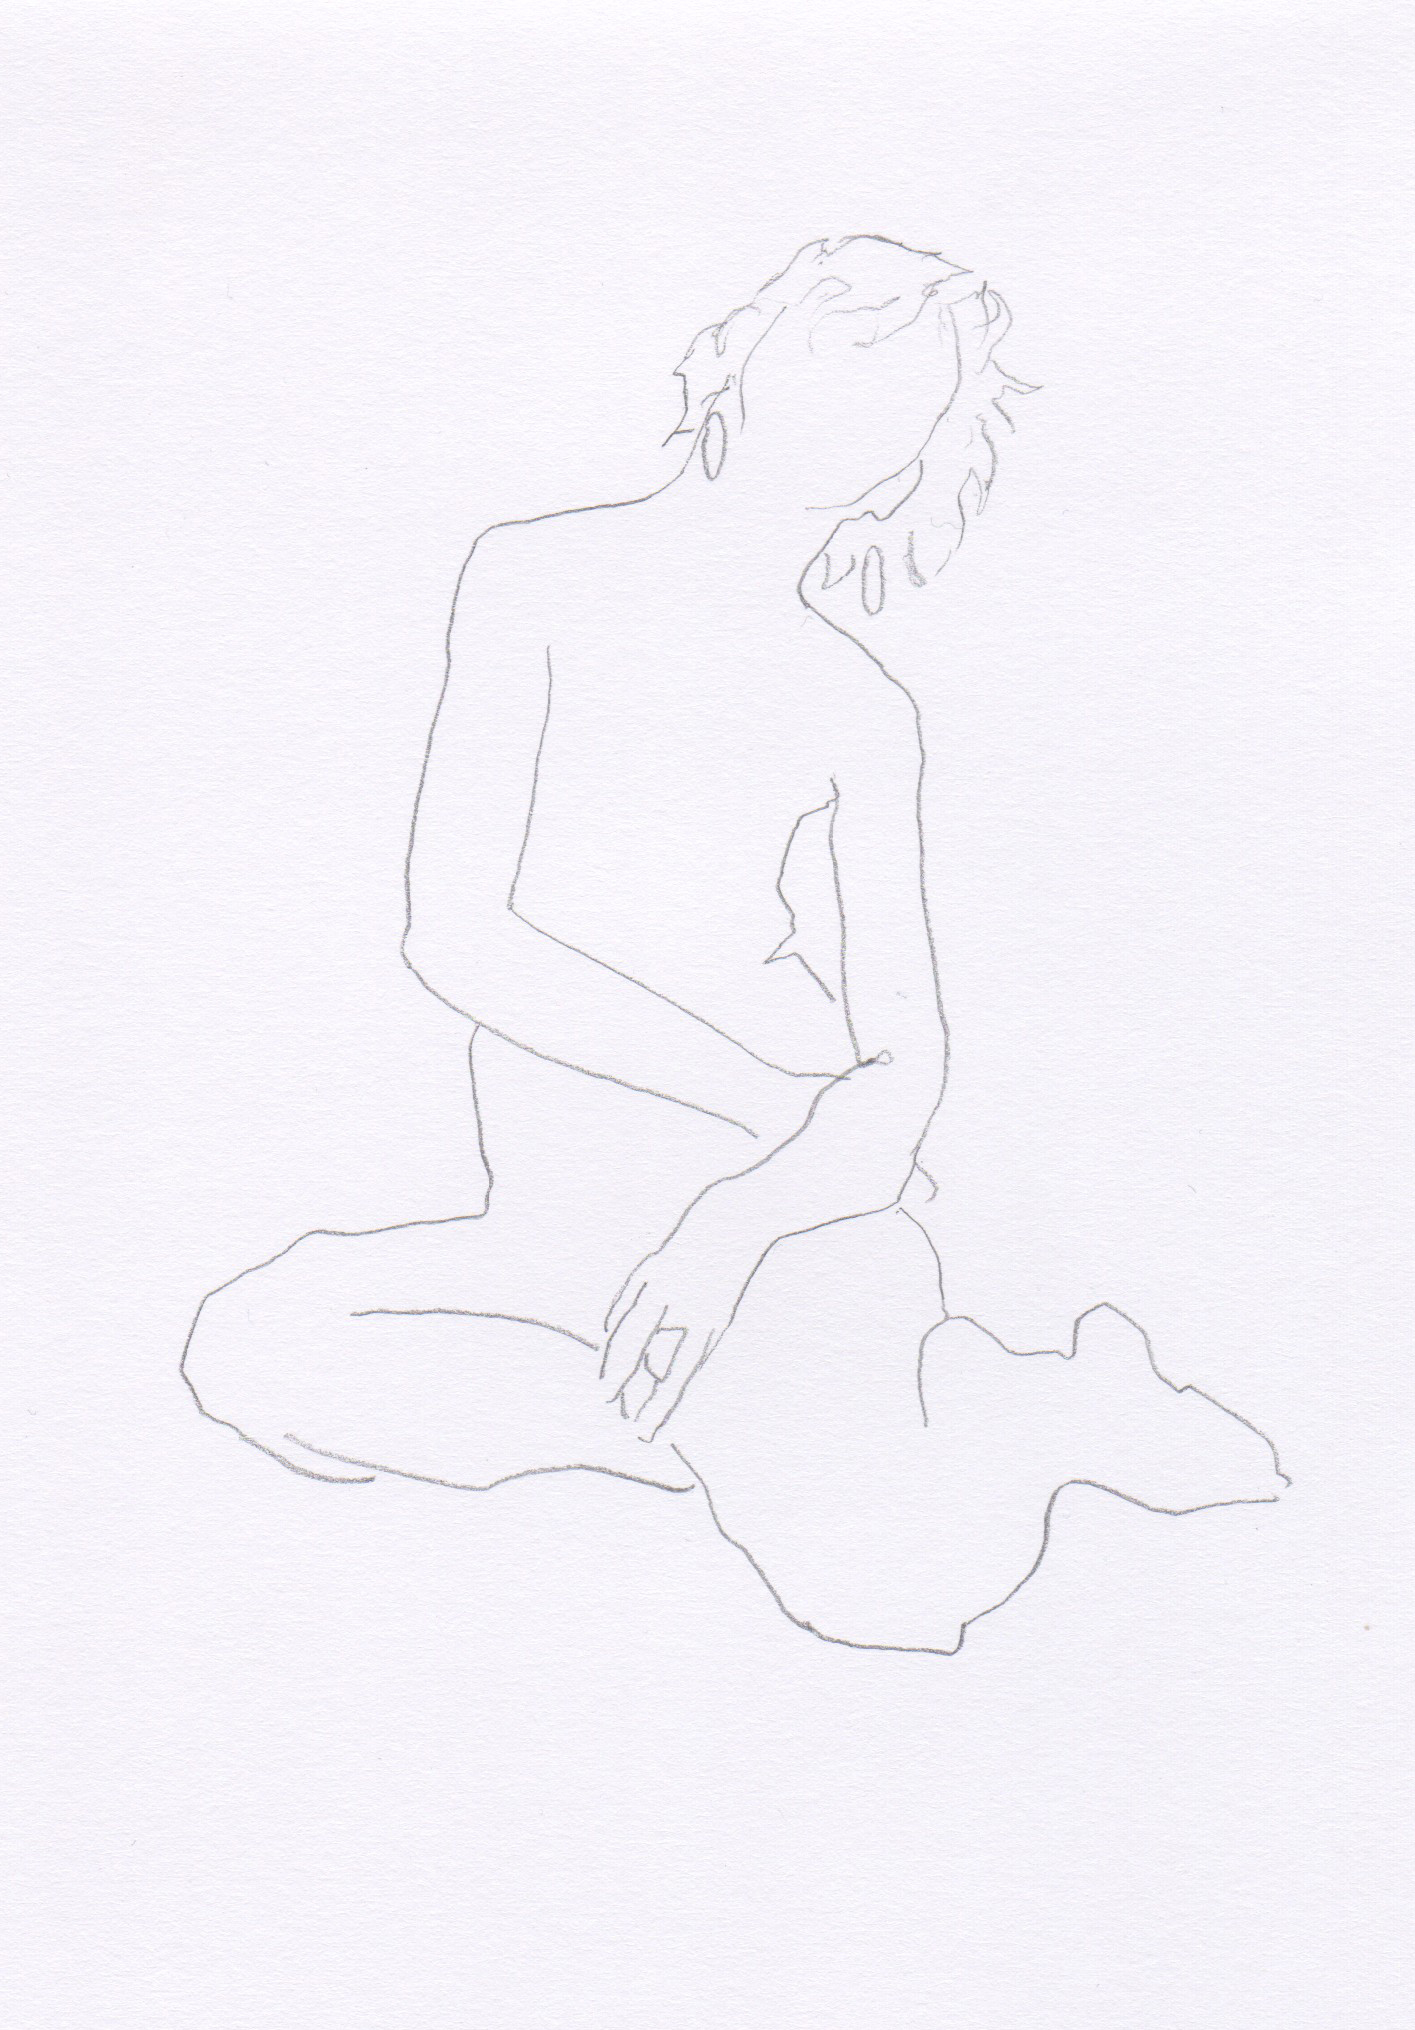 2016_Sketch_F-Beudin_x_02